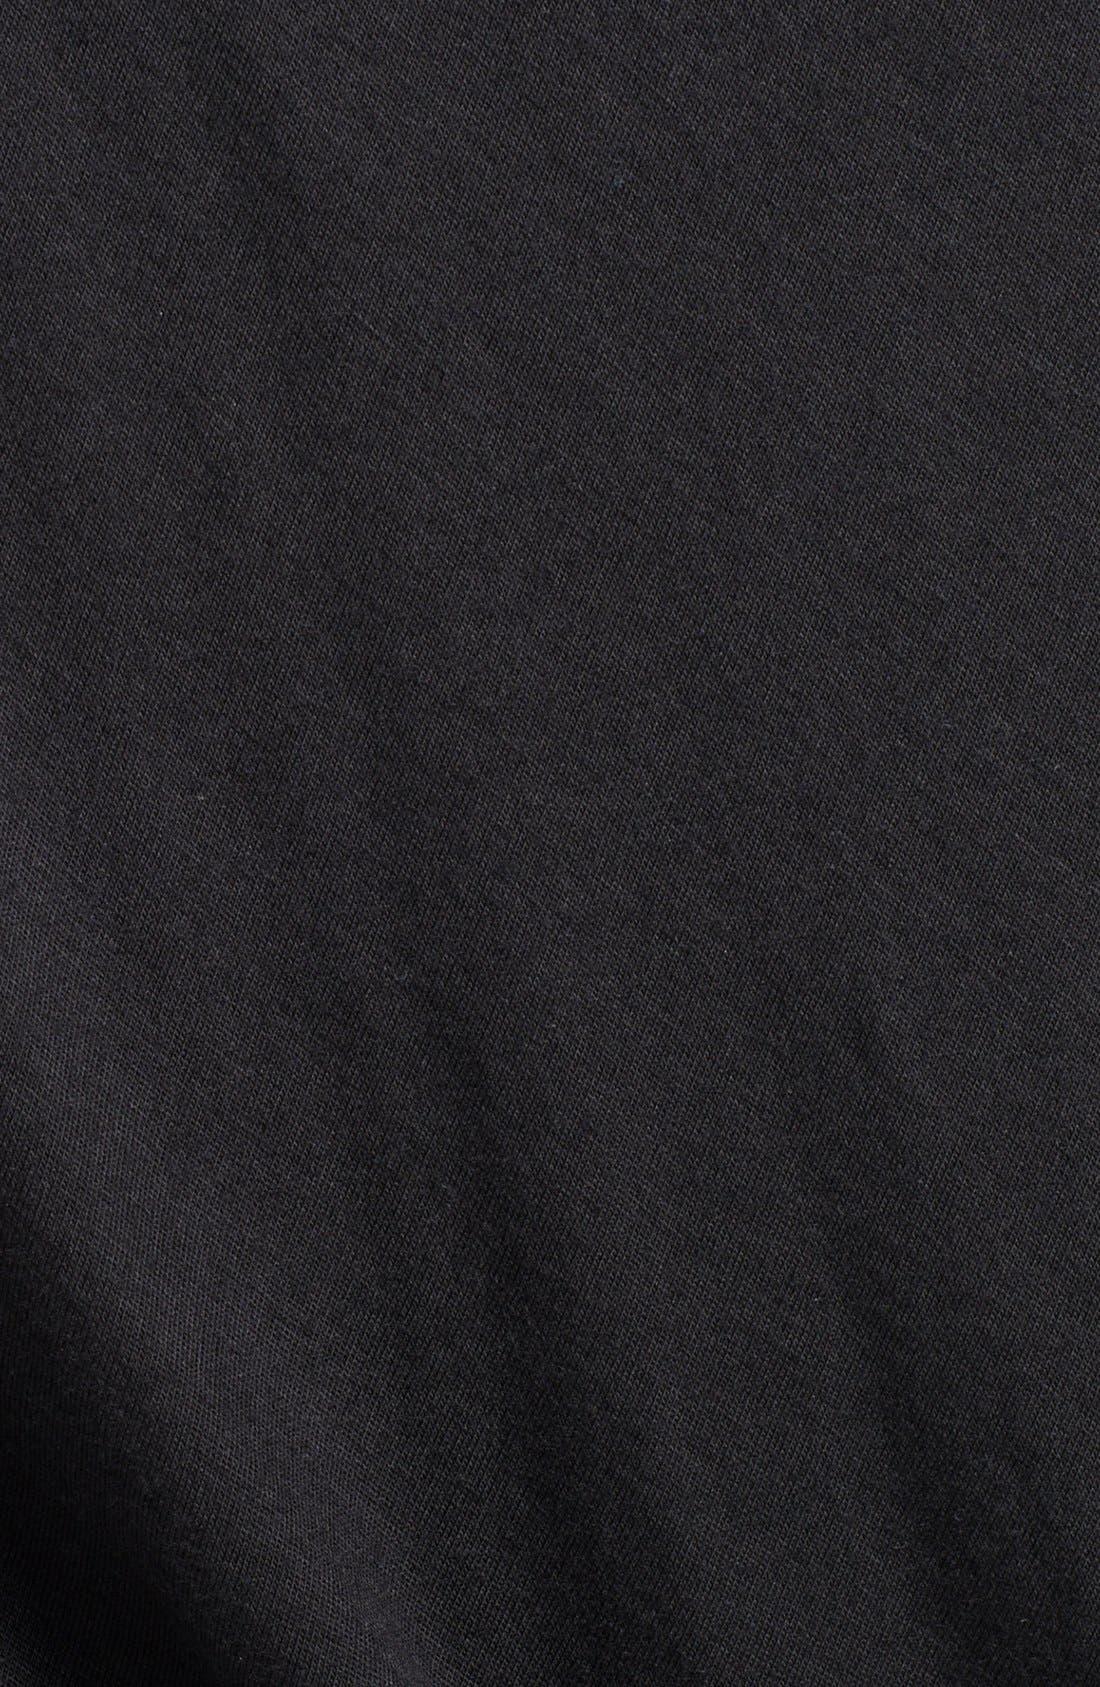 Alternate Image 4  - HELMUT Helmut Lang 'Nova Jersey' Top